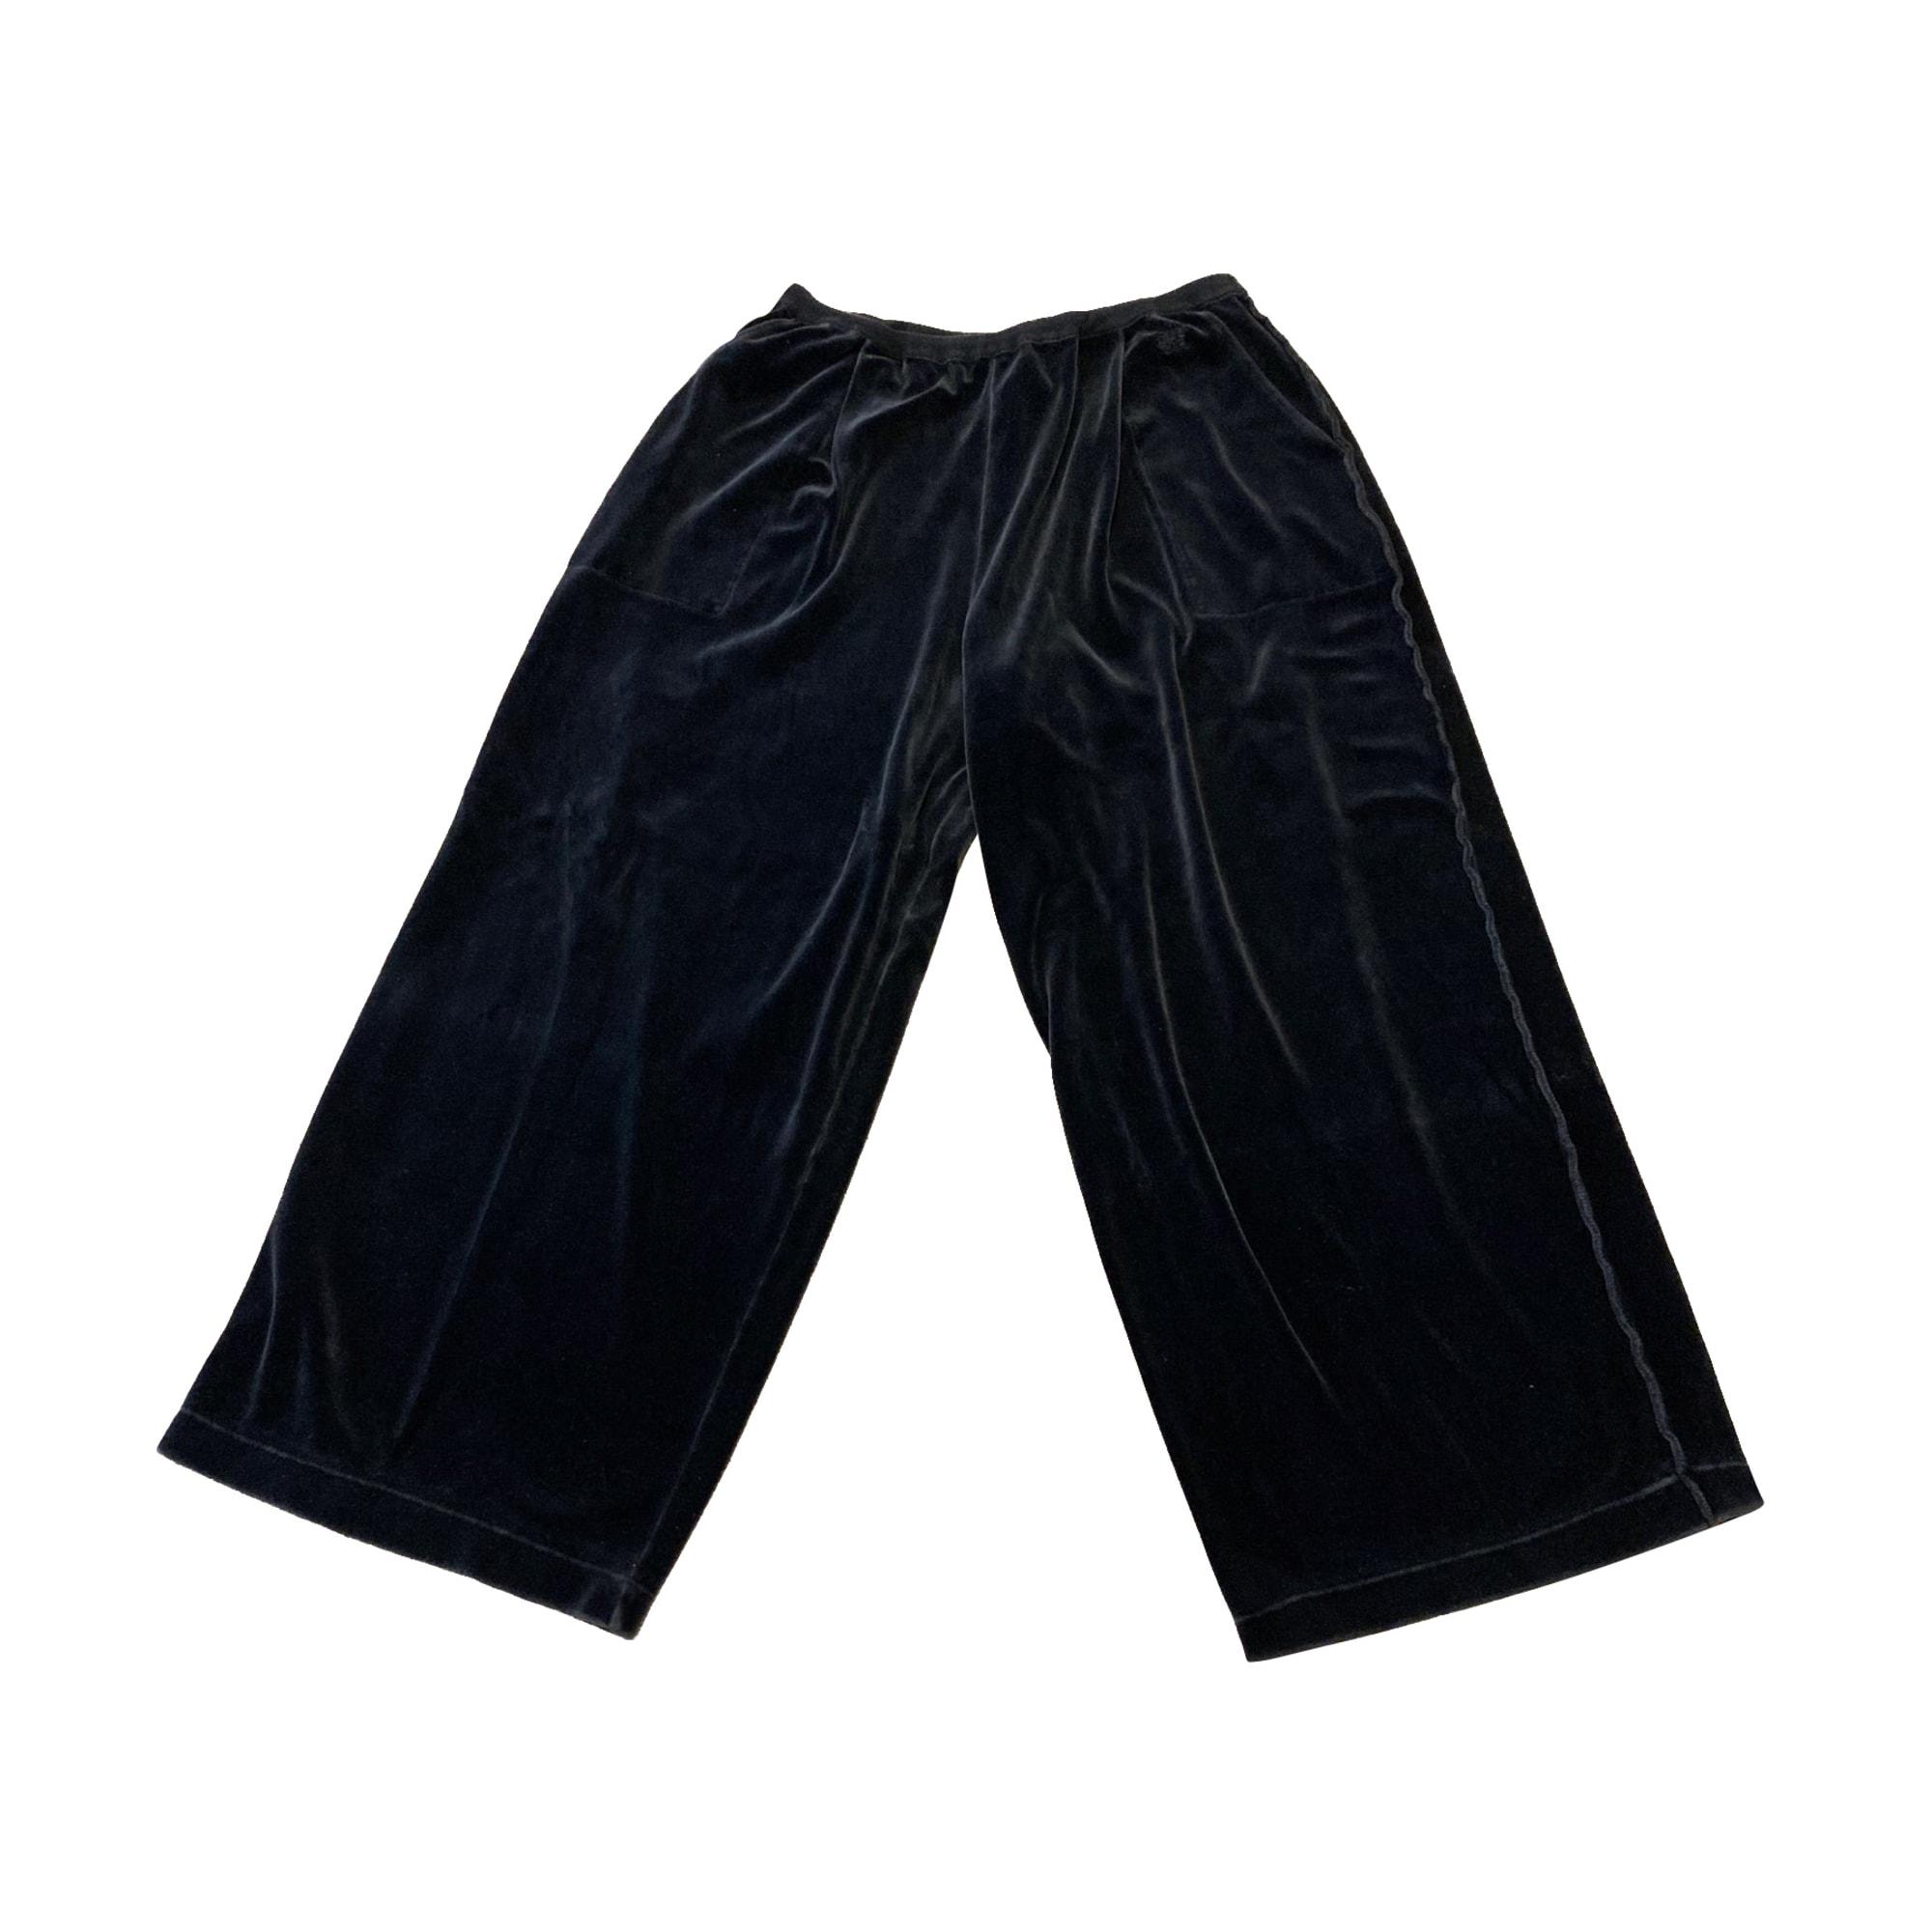 Wide Leg Pants SONIA RYKIEL Black